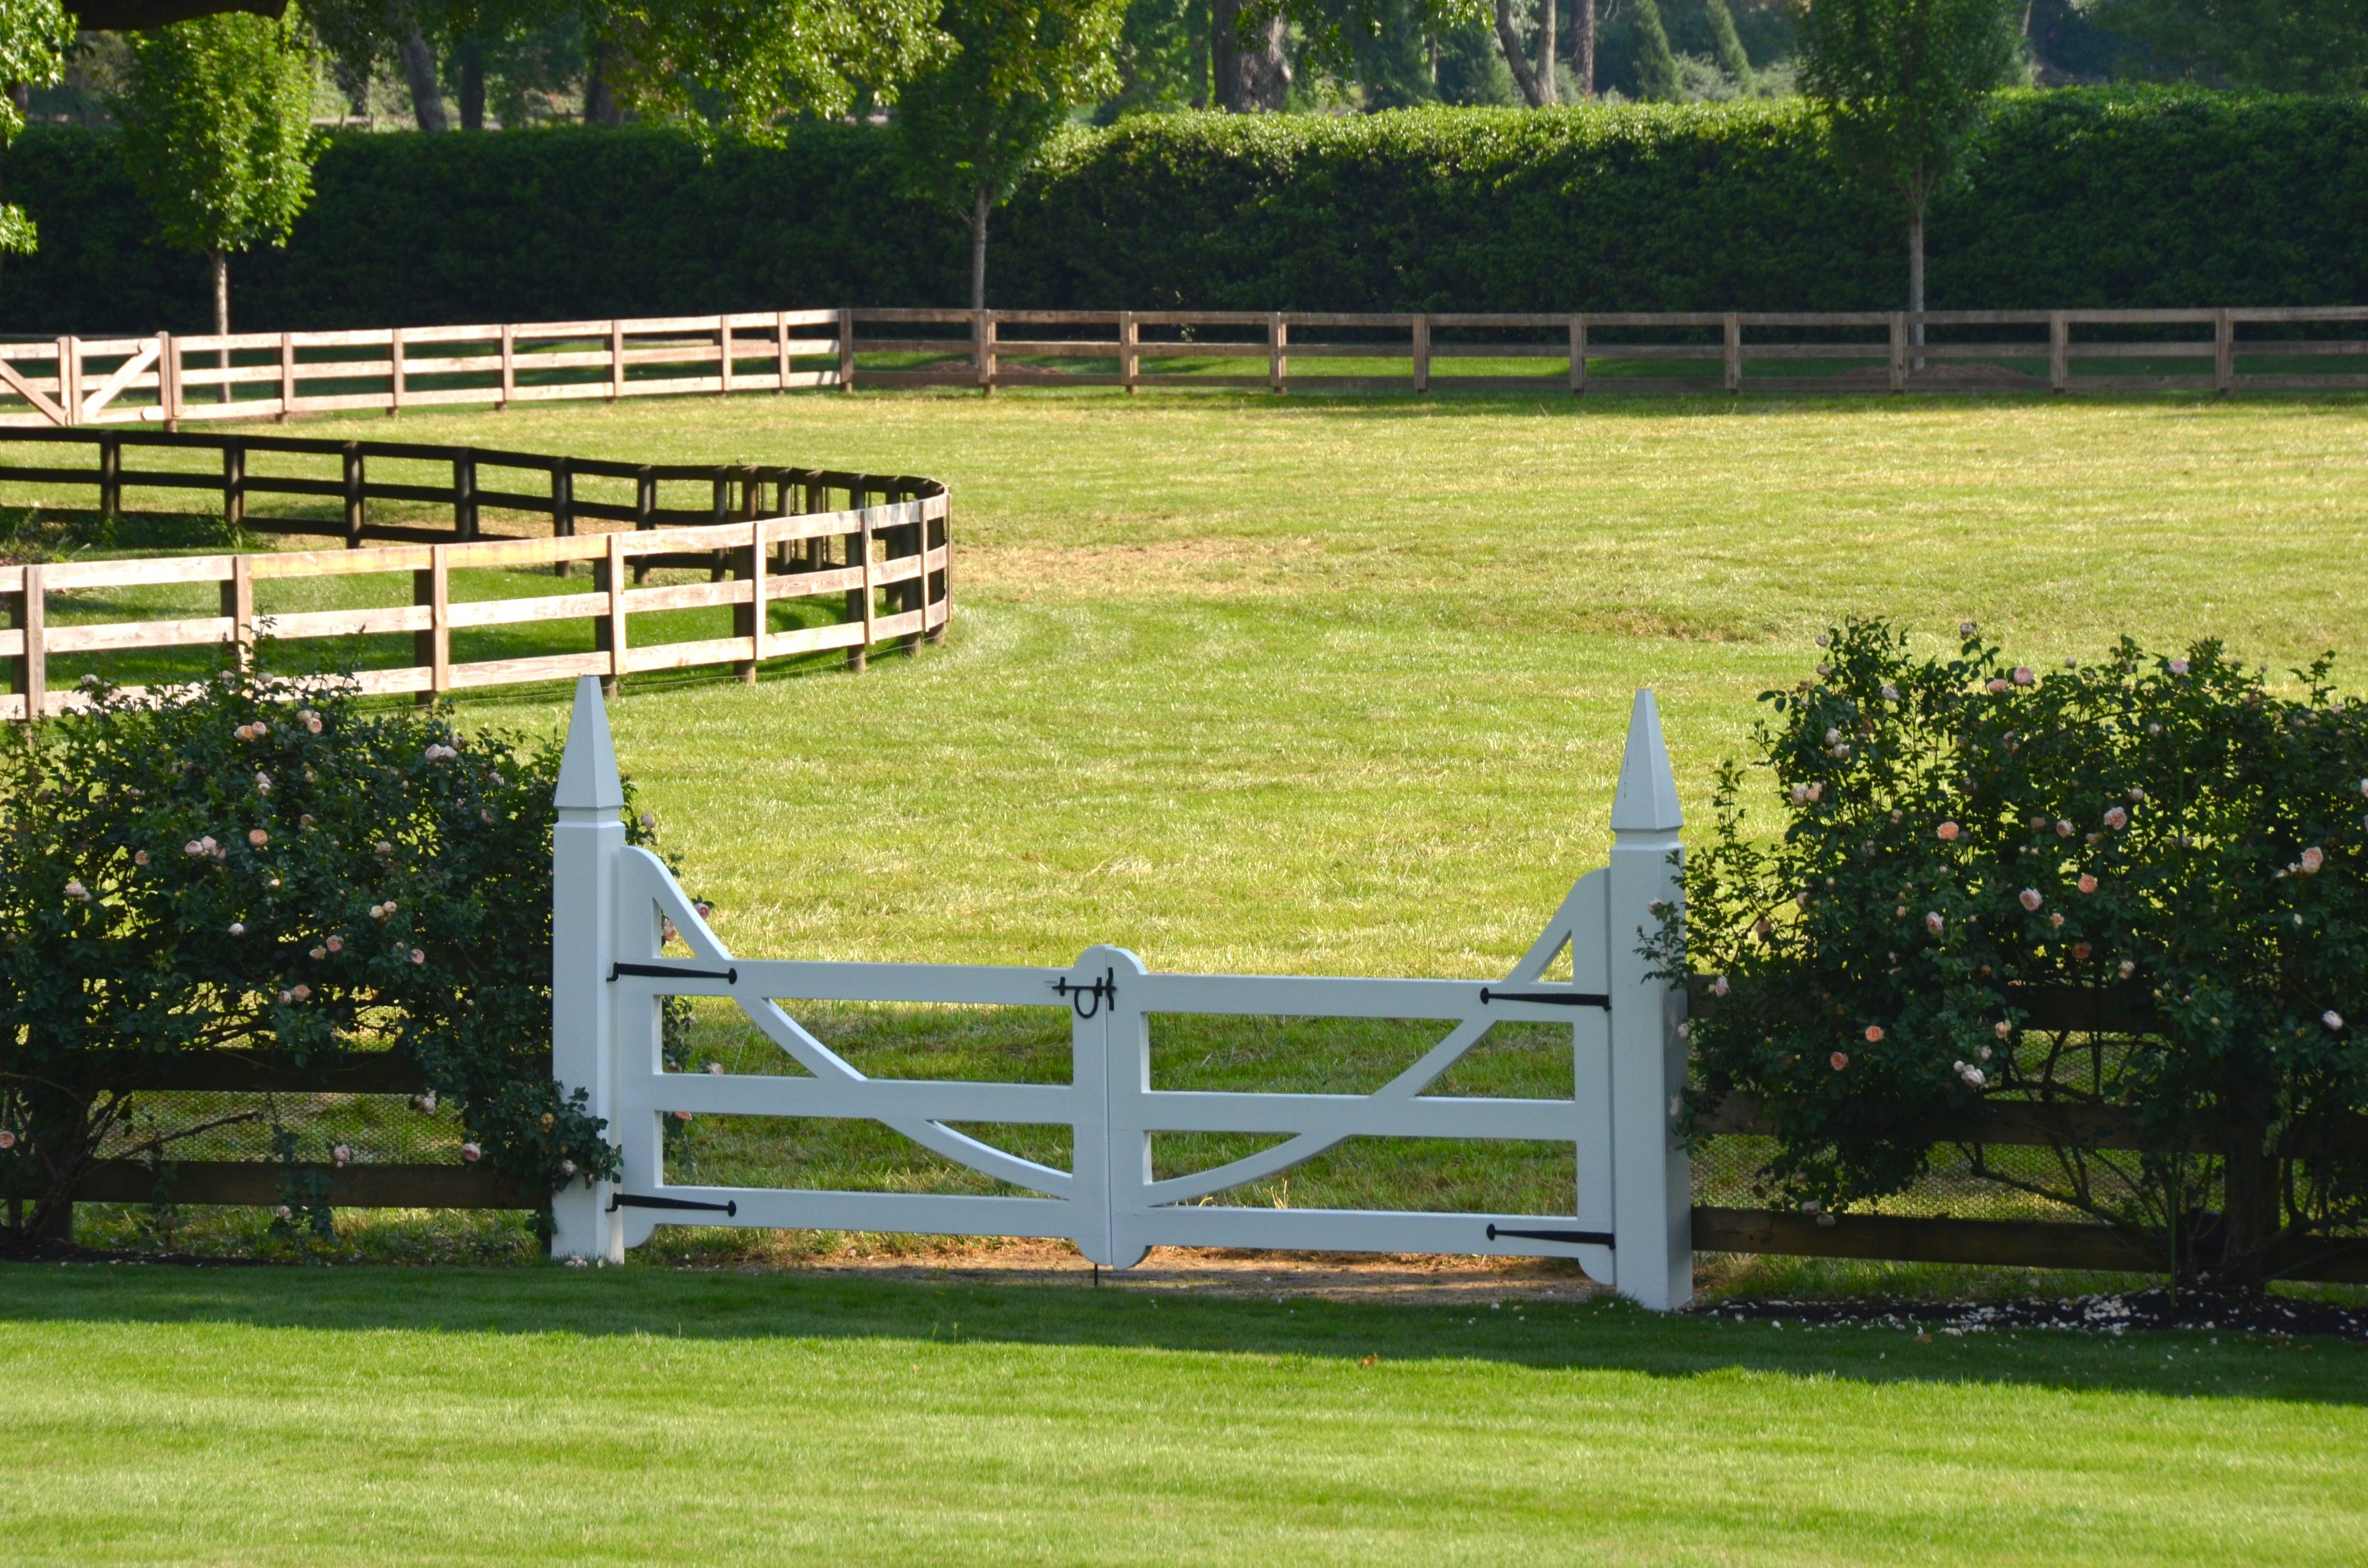 Landscape architect atlanta ga - White Gate On A Wood Fence A Planters Design Atlanta Ga